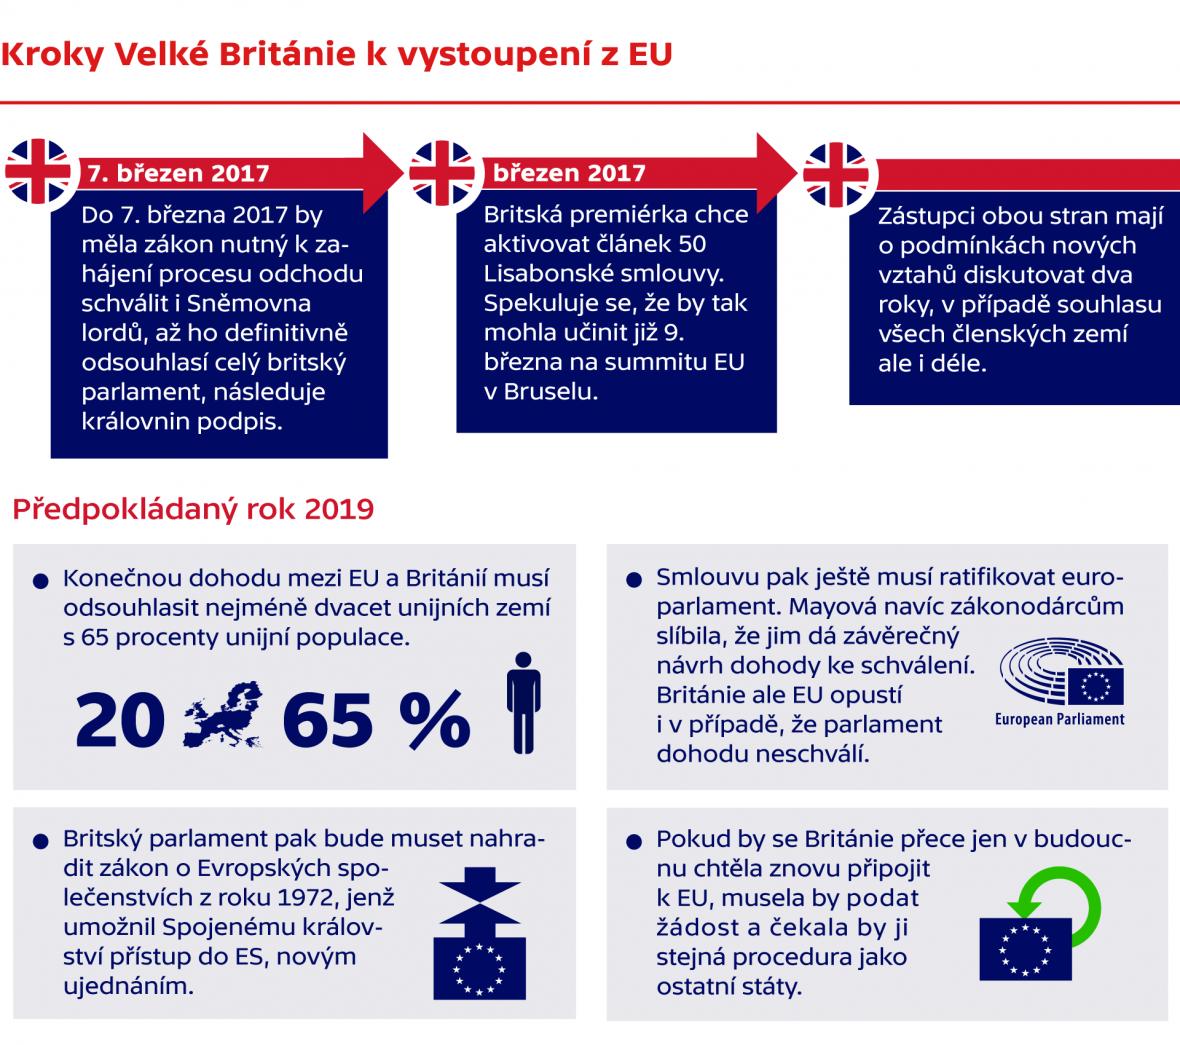 Kroky Velké Británie k vystoupení z EU